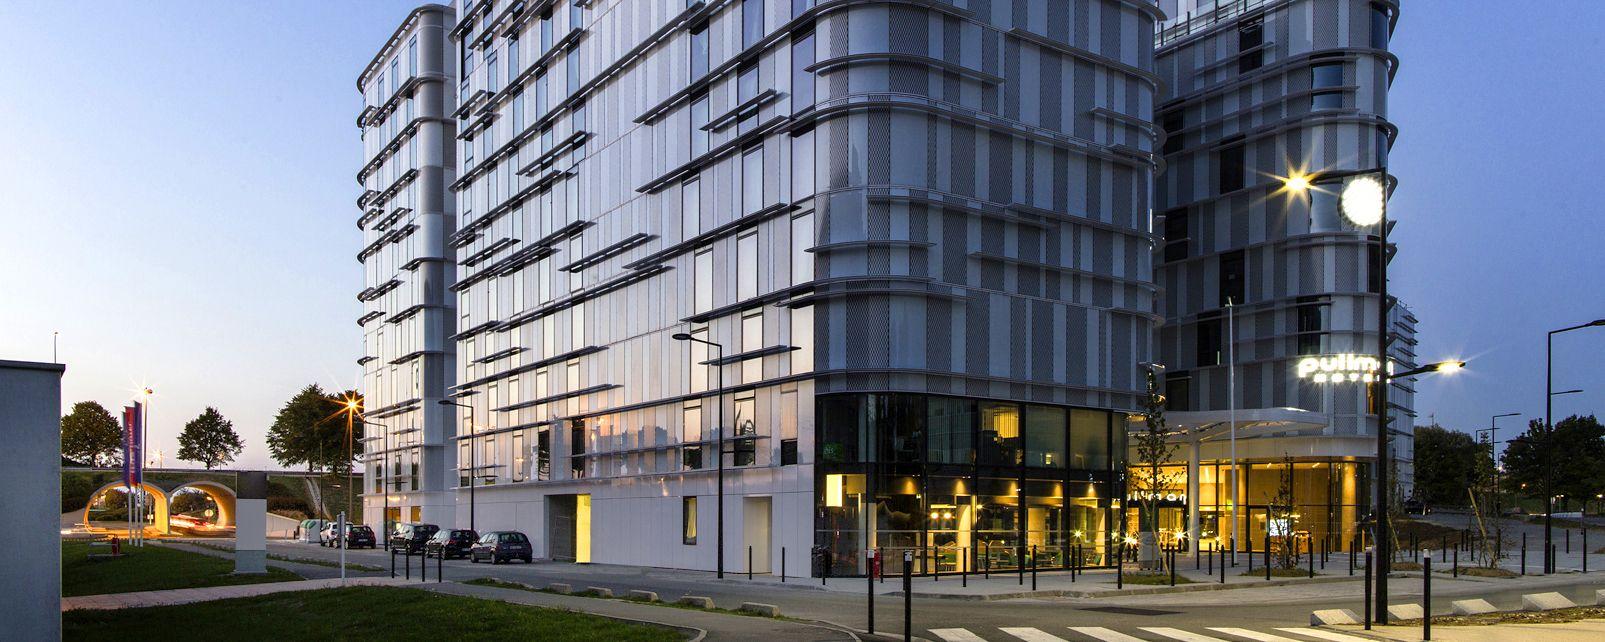 Hôtel Ibis Styles Roissy CDG